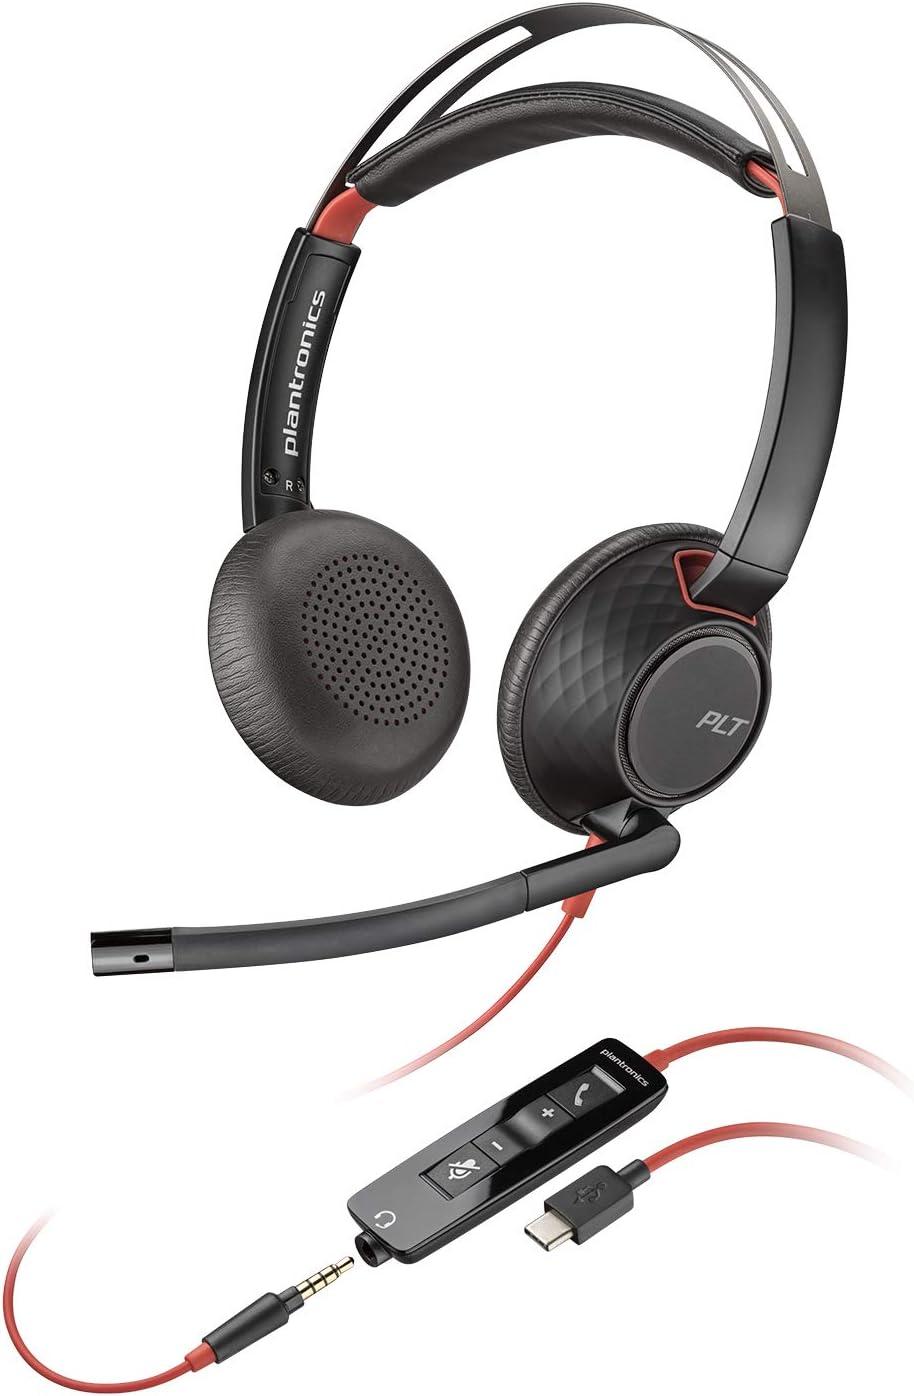 Plantronics Blackwire 5220 - Auriculares con micrófono (Centro de llamadas/Oficina, Binaural, Diadema, Negro, Rojo, Skype for Business, Alámbrico)